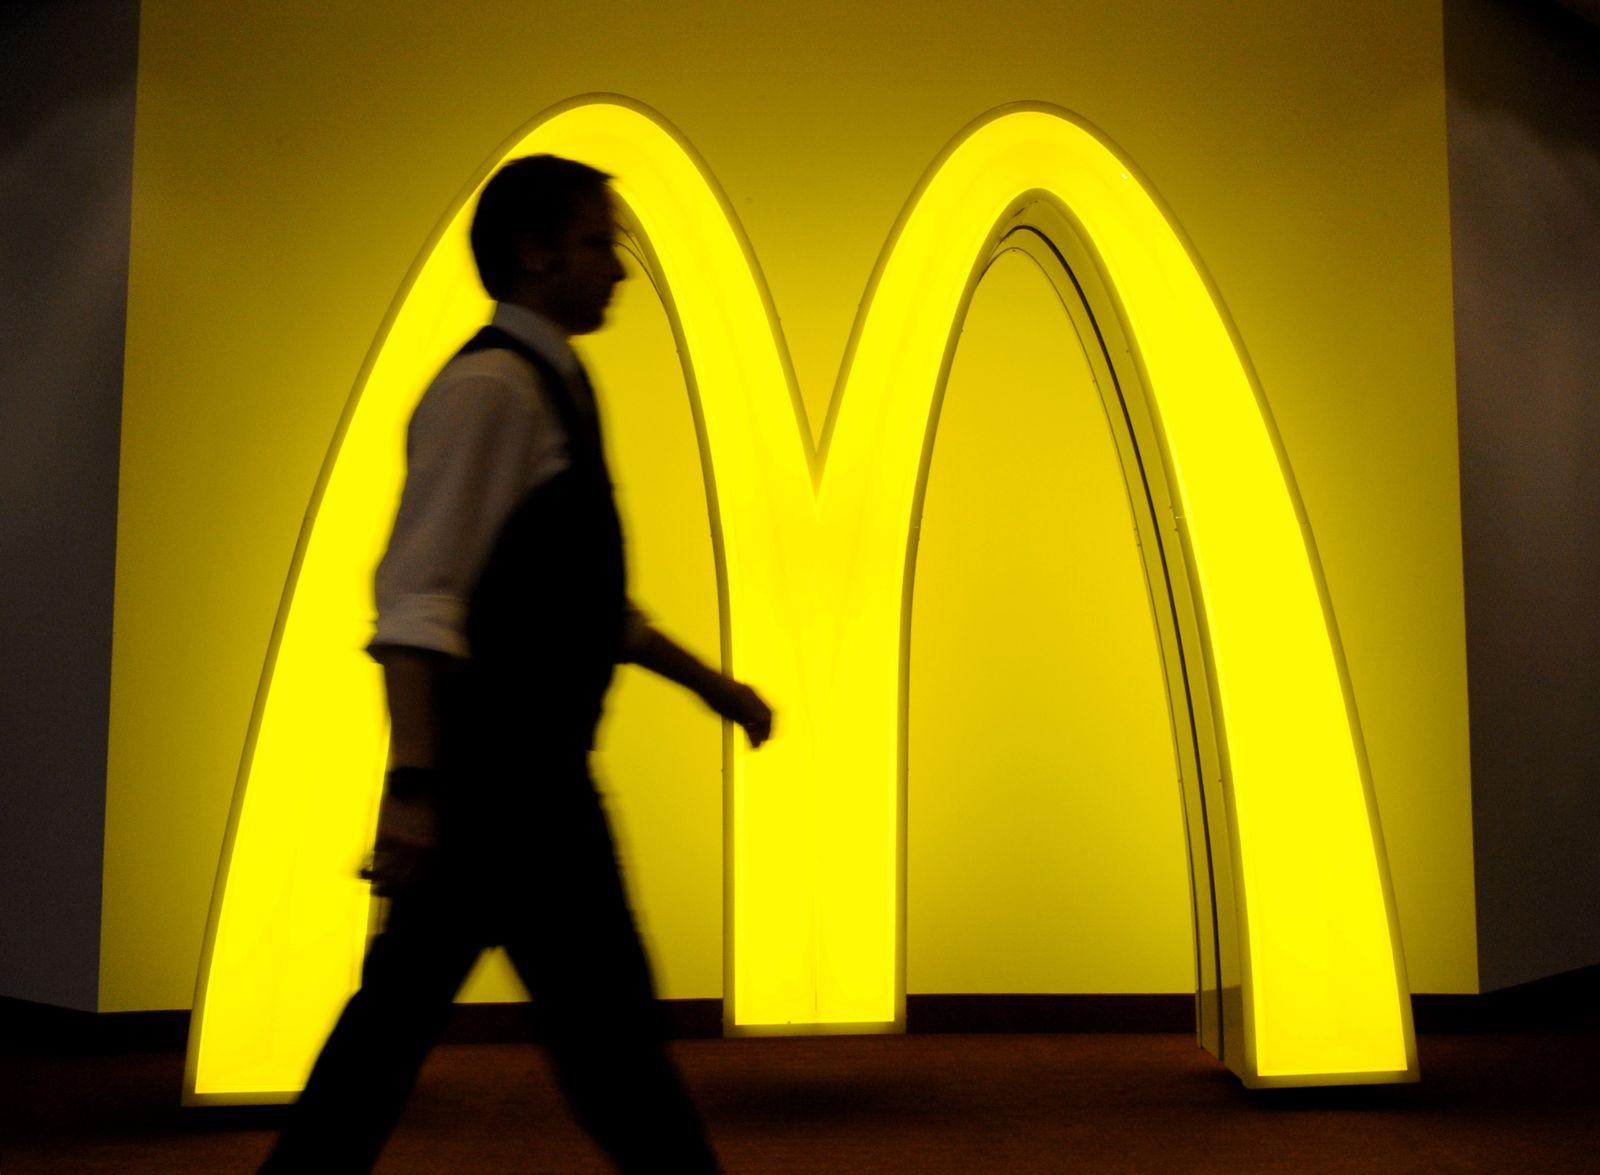 McDonalds Quartalszahlen